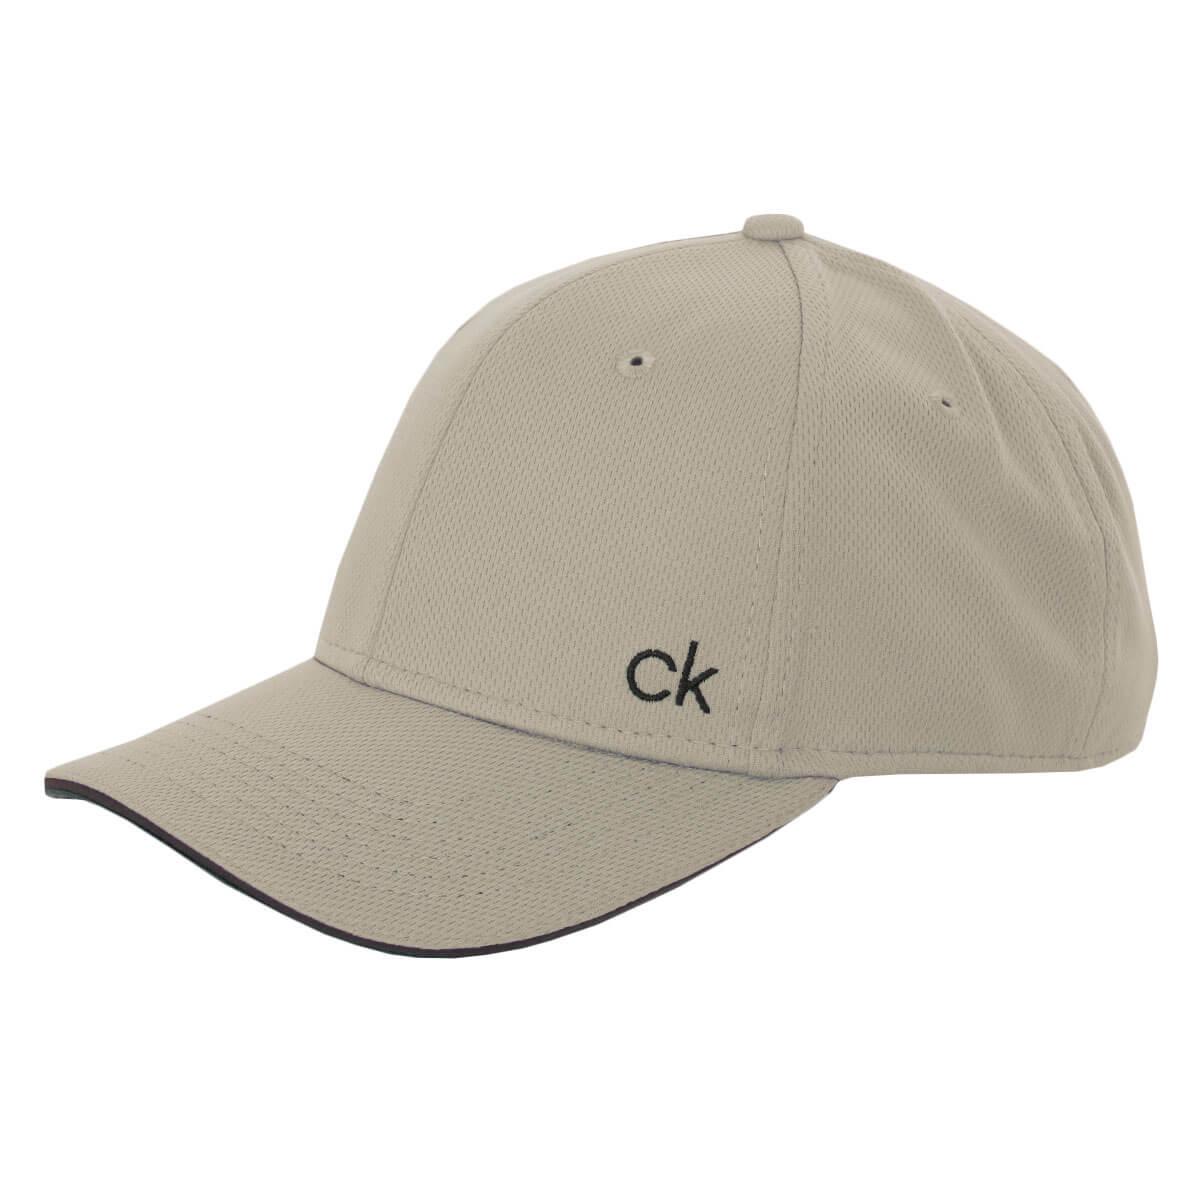 Calvin-Klein-Golf-2019-Airtex-Performance-Adjustable-Quick-Dry-Cap-40-OFF-RRP thumbnail 17